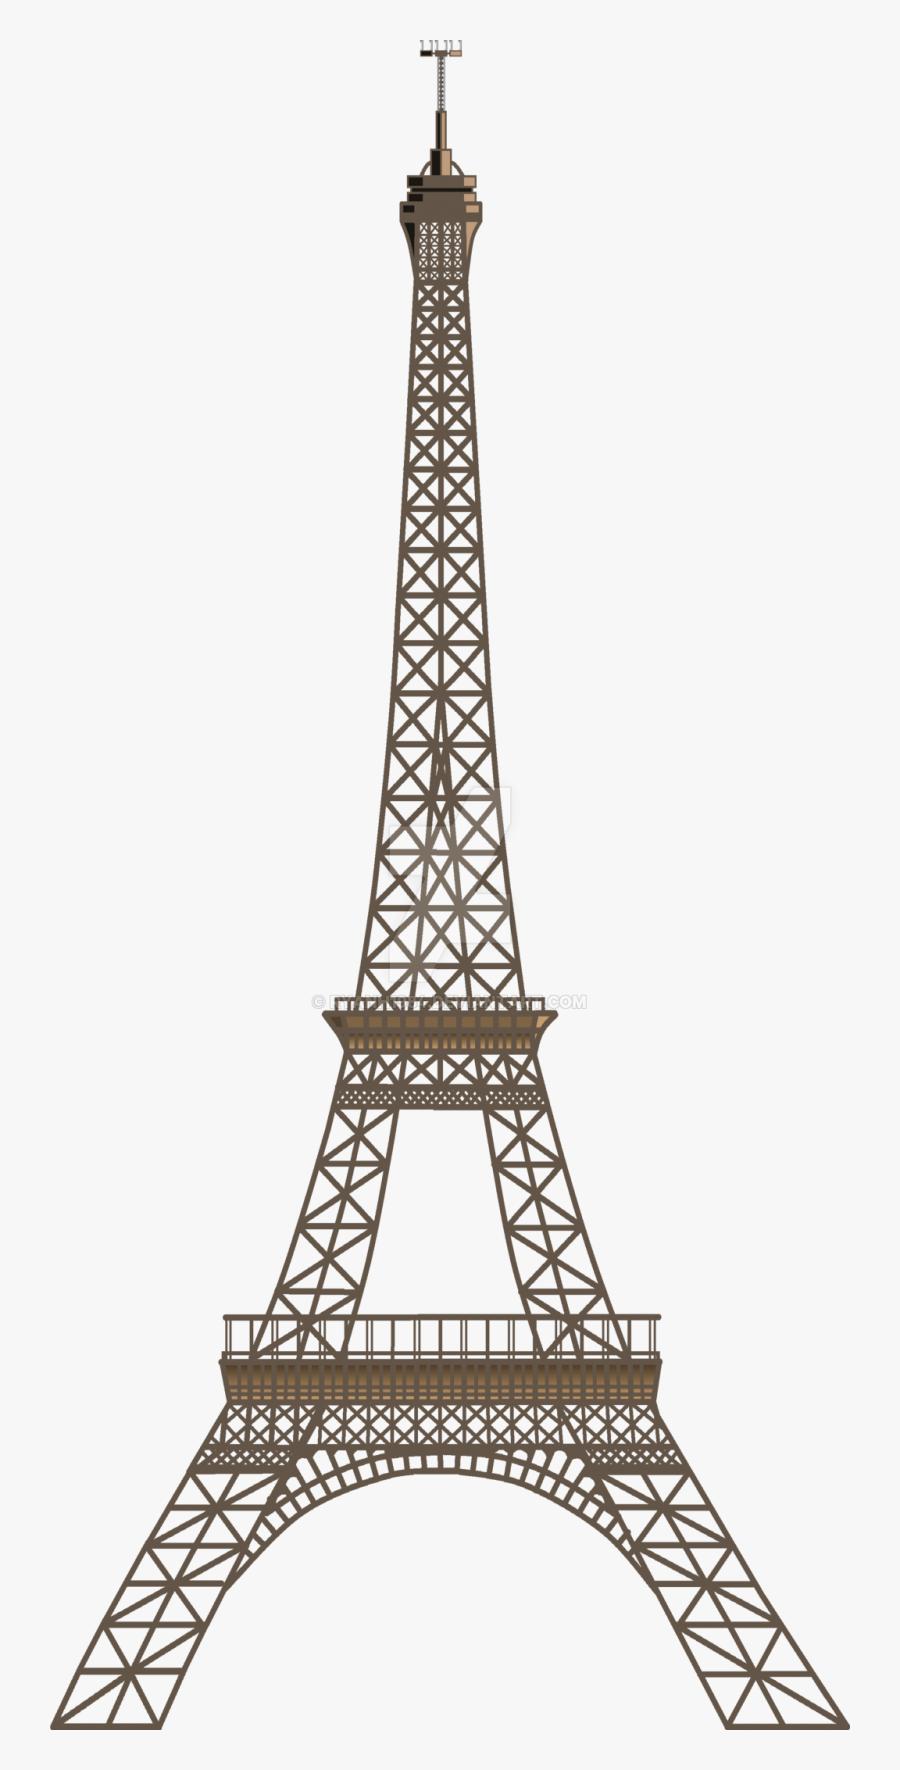 Two Dimensional Eiffel Tower - Paris Eiffel Tower Clipart, Transparent Clipart